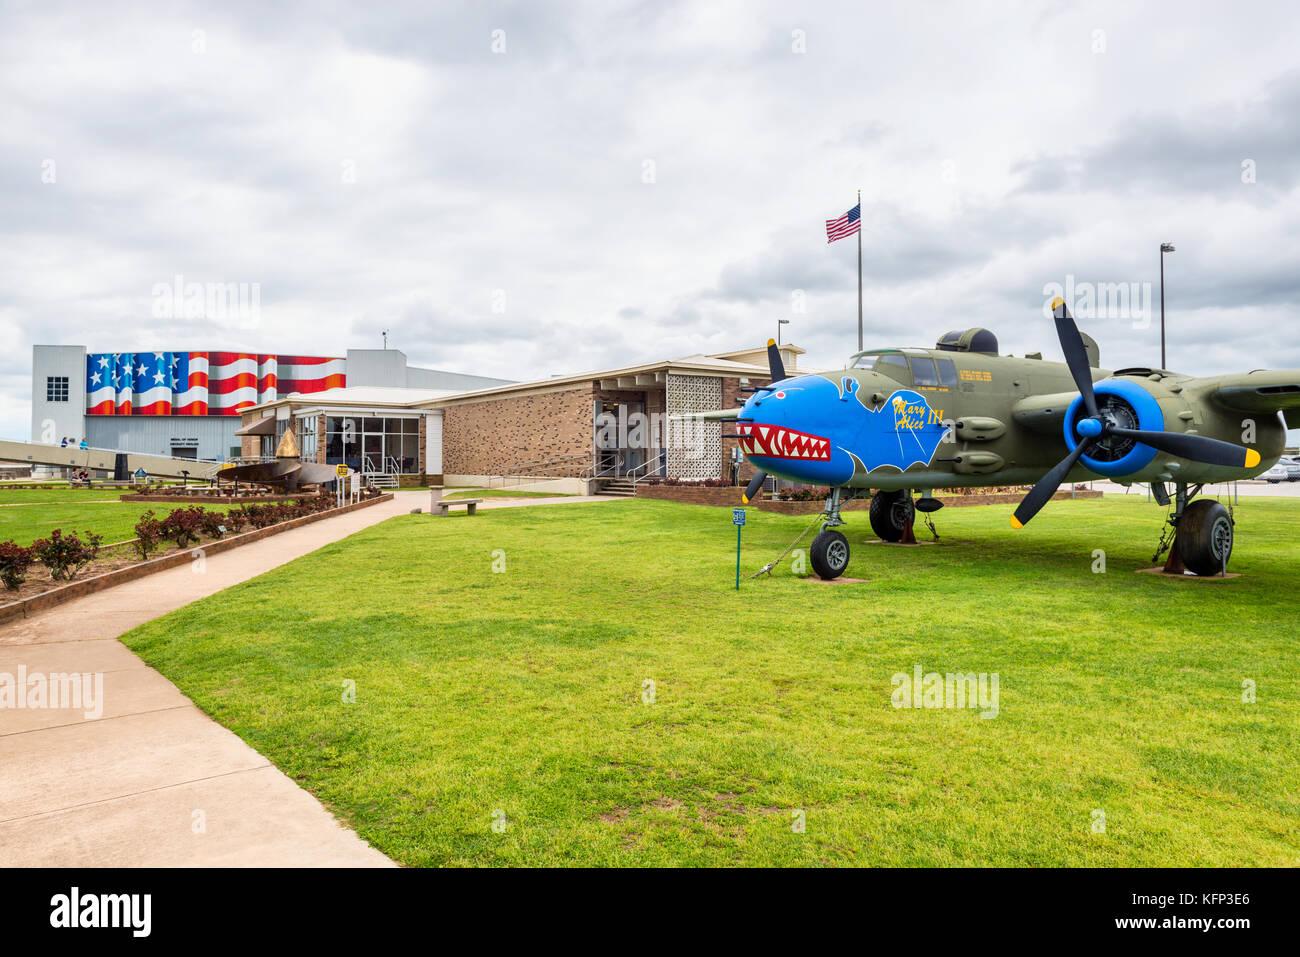 USS Alabama Battleship Memorial Park in Mobile, Alabama, USA. The park has a collection of notable military aircraft - Stock Image